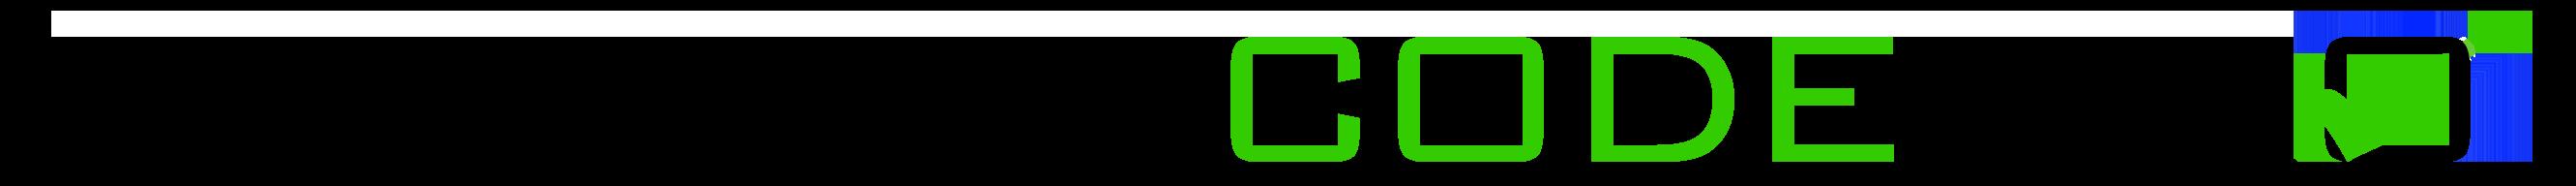 Housing-Code-Pro-logo1